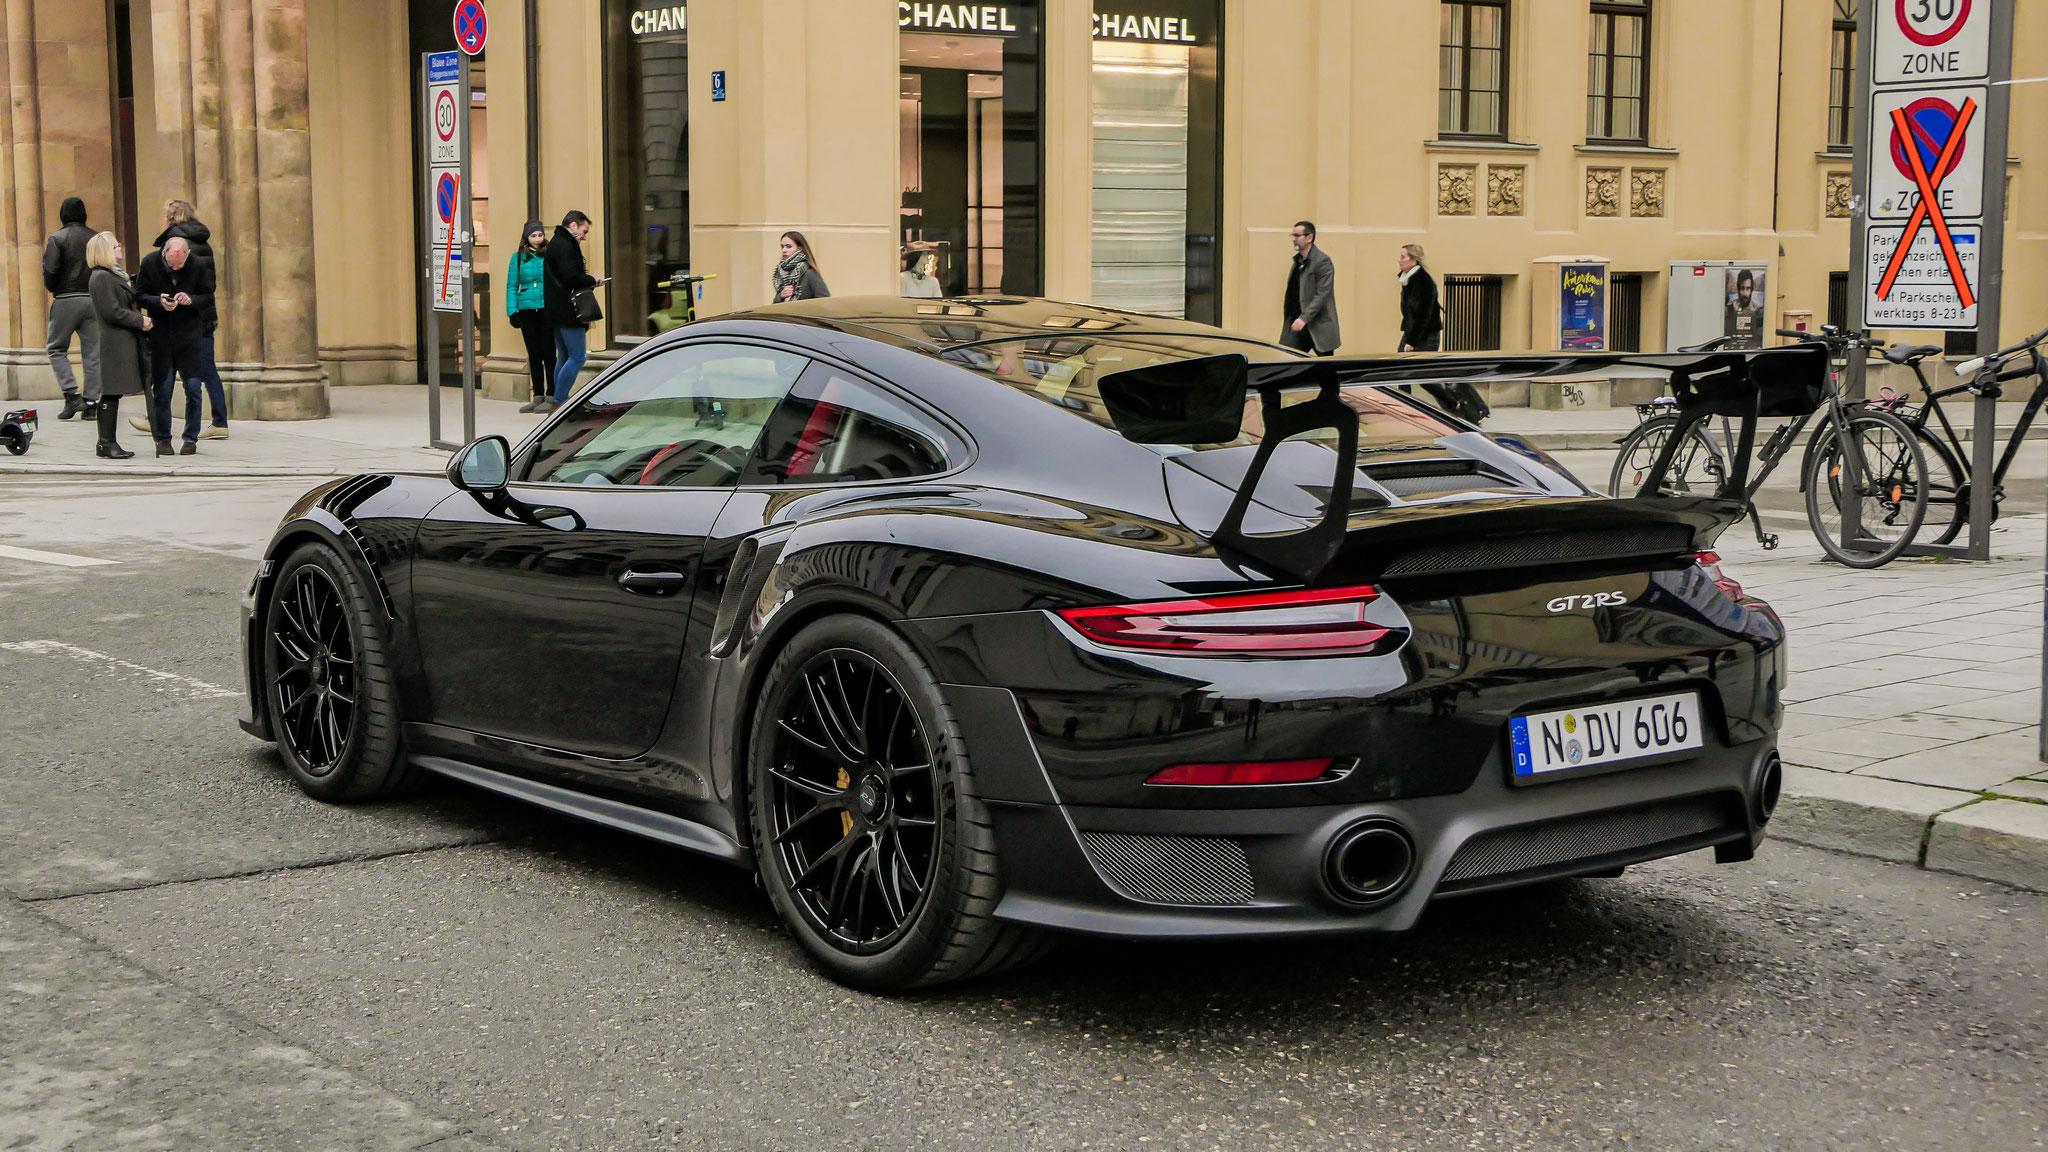 Porsche GT2 RS - N-DV-606